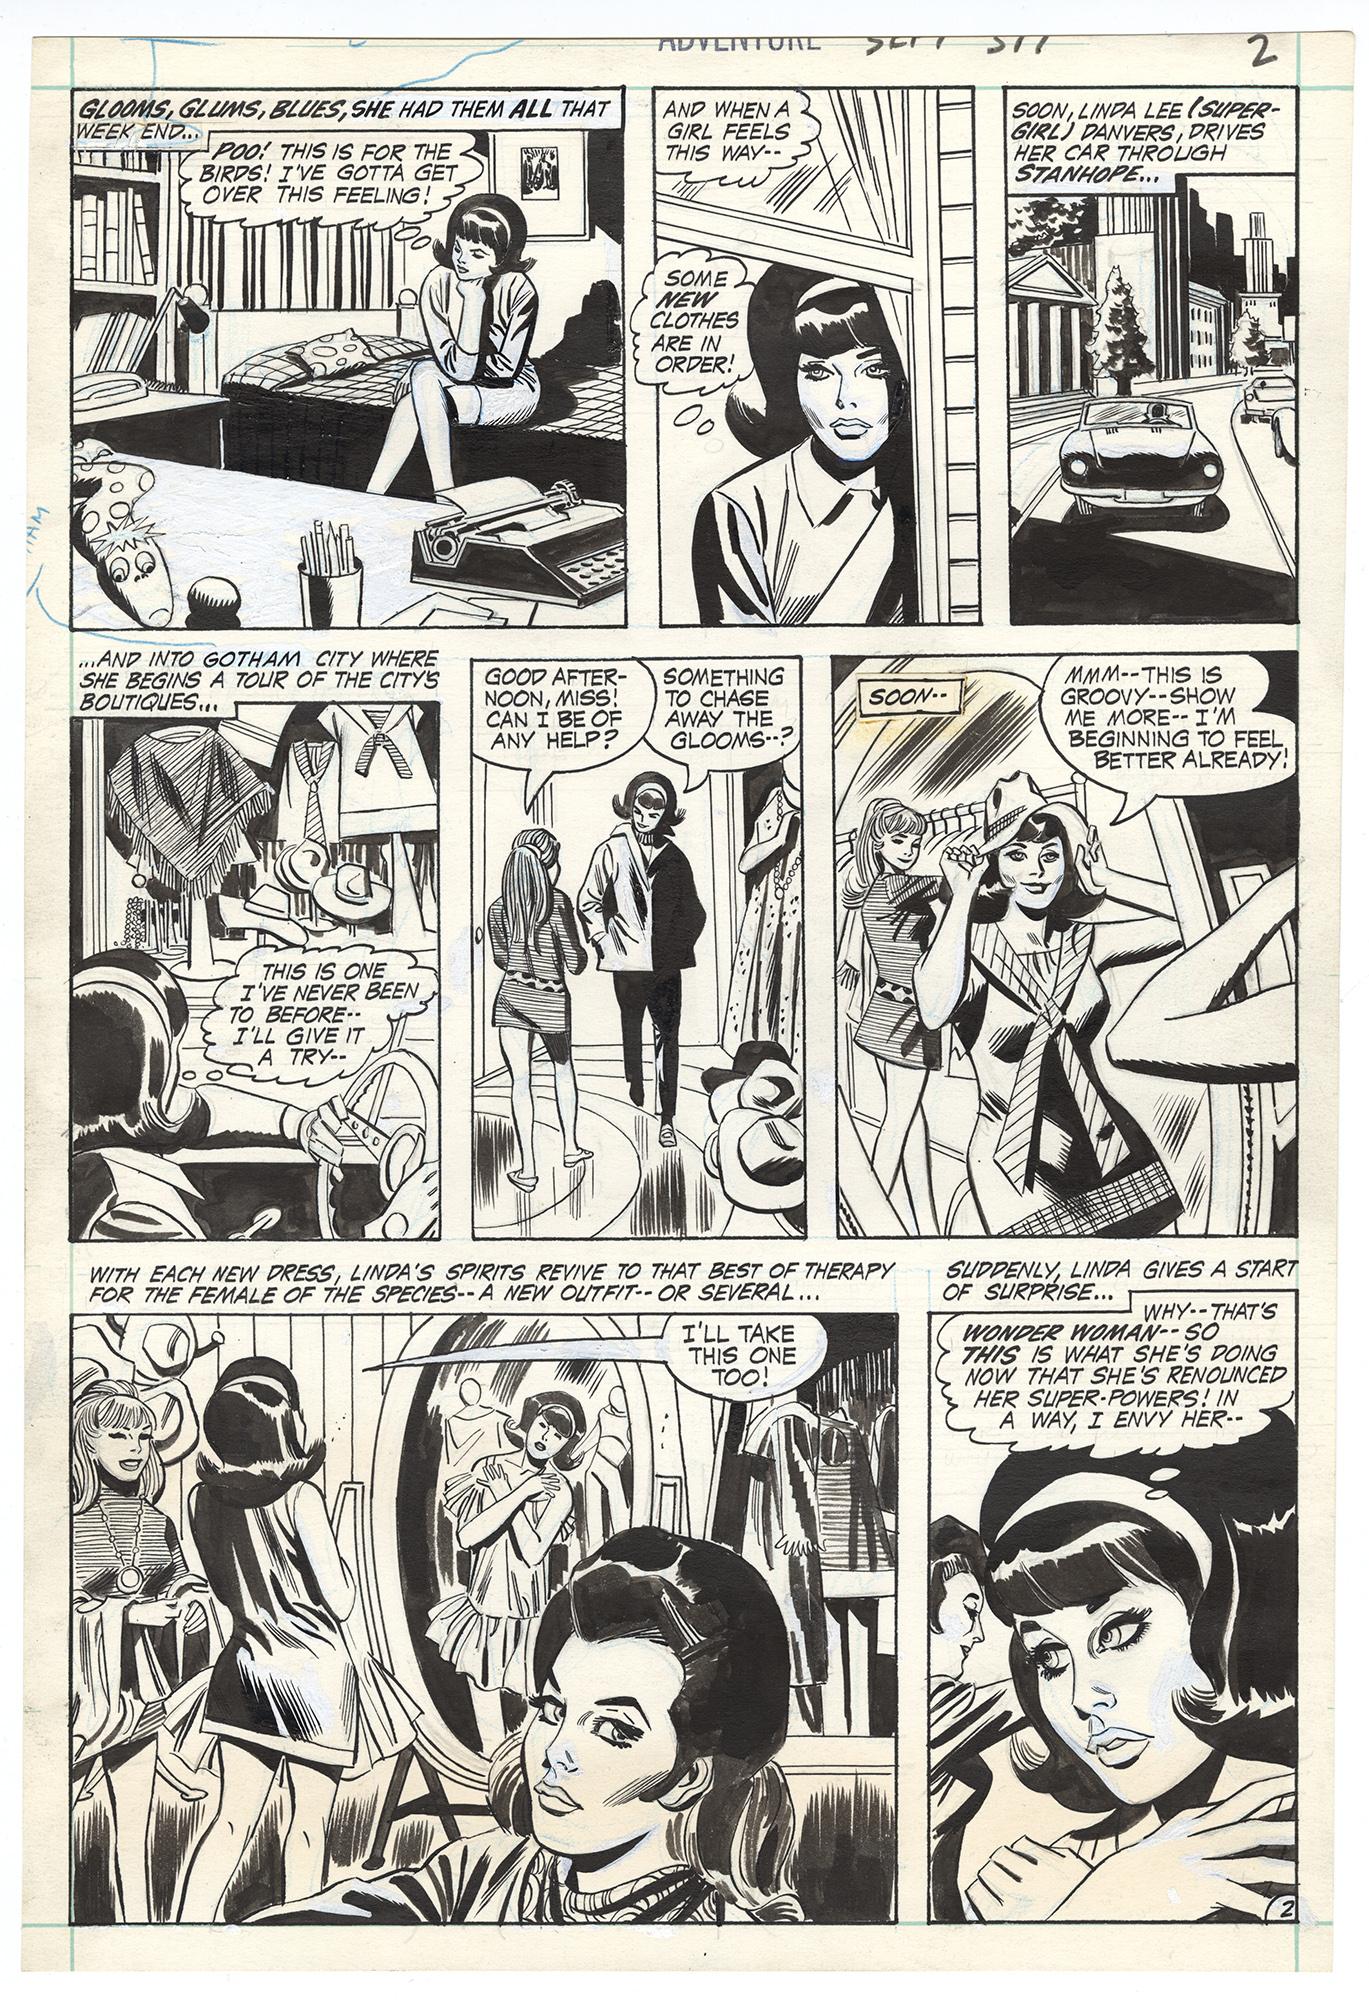 Adventure Comics #397 p2 (Supergirl and Wonder Woman)